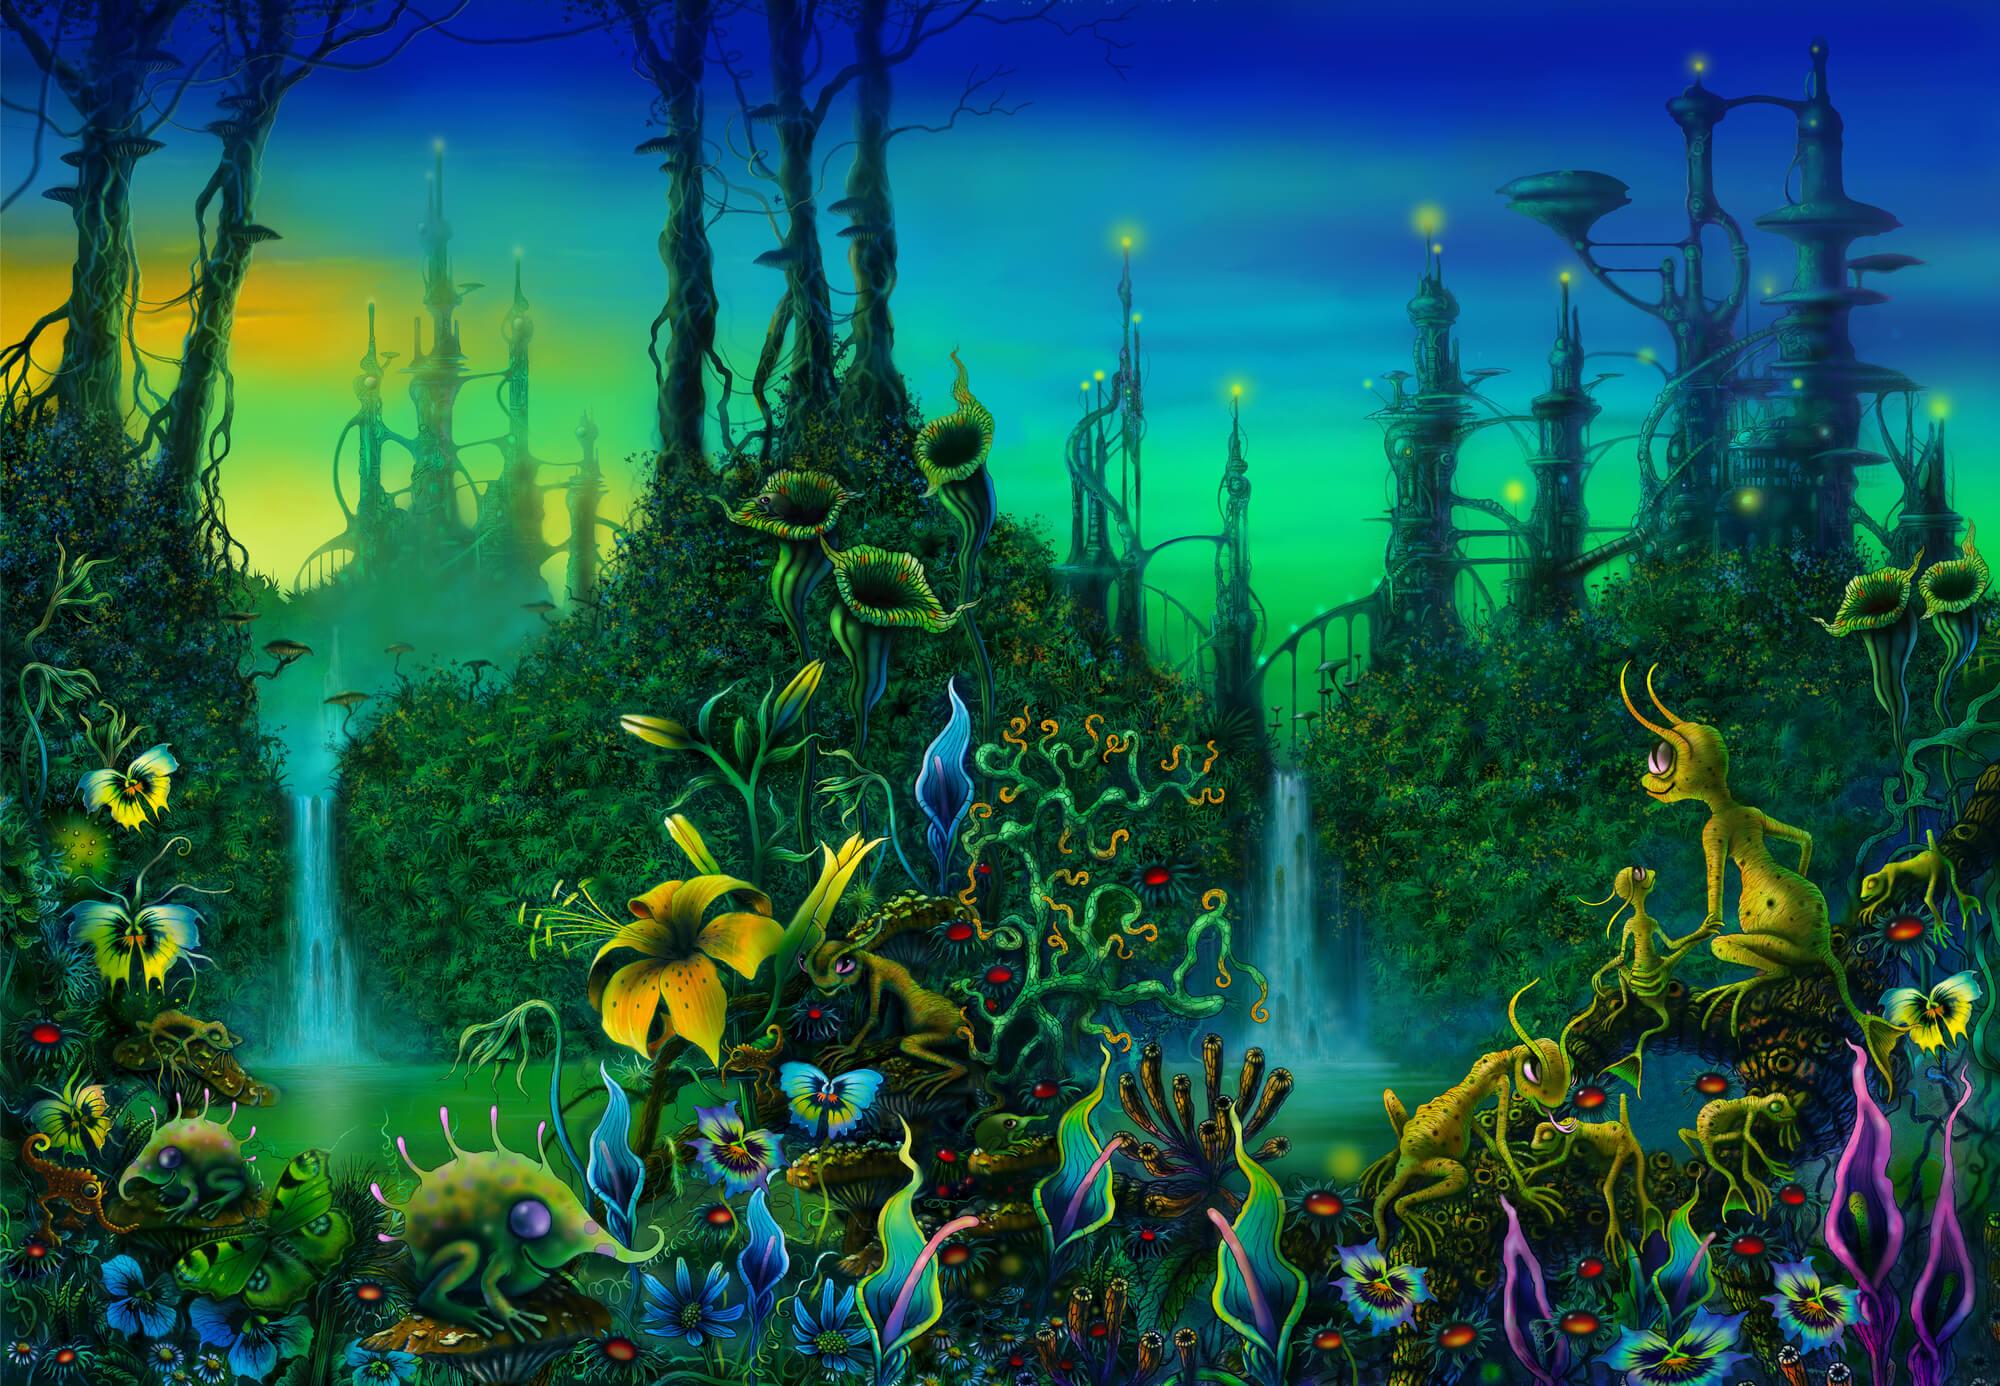 Alien Jungle Wall Mural